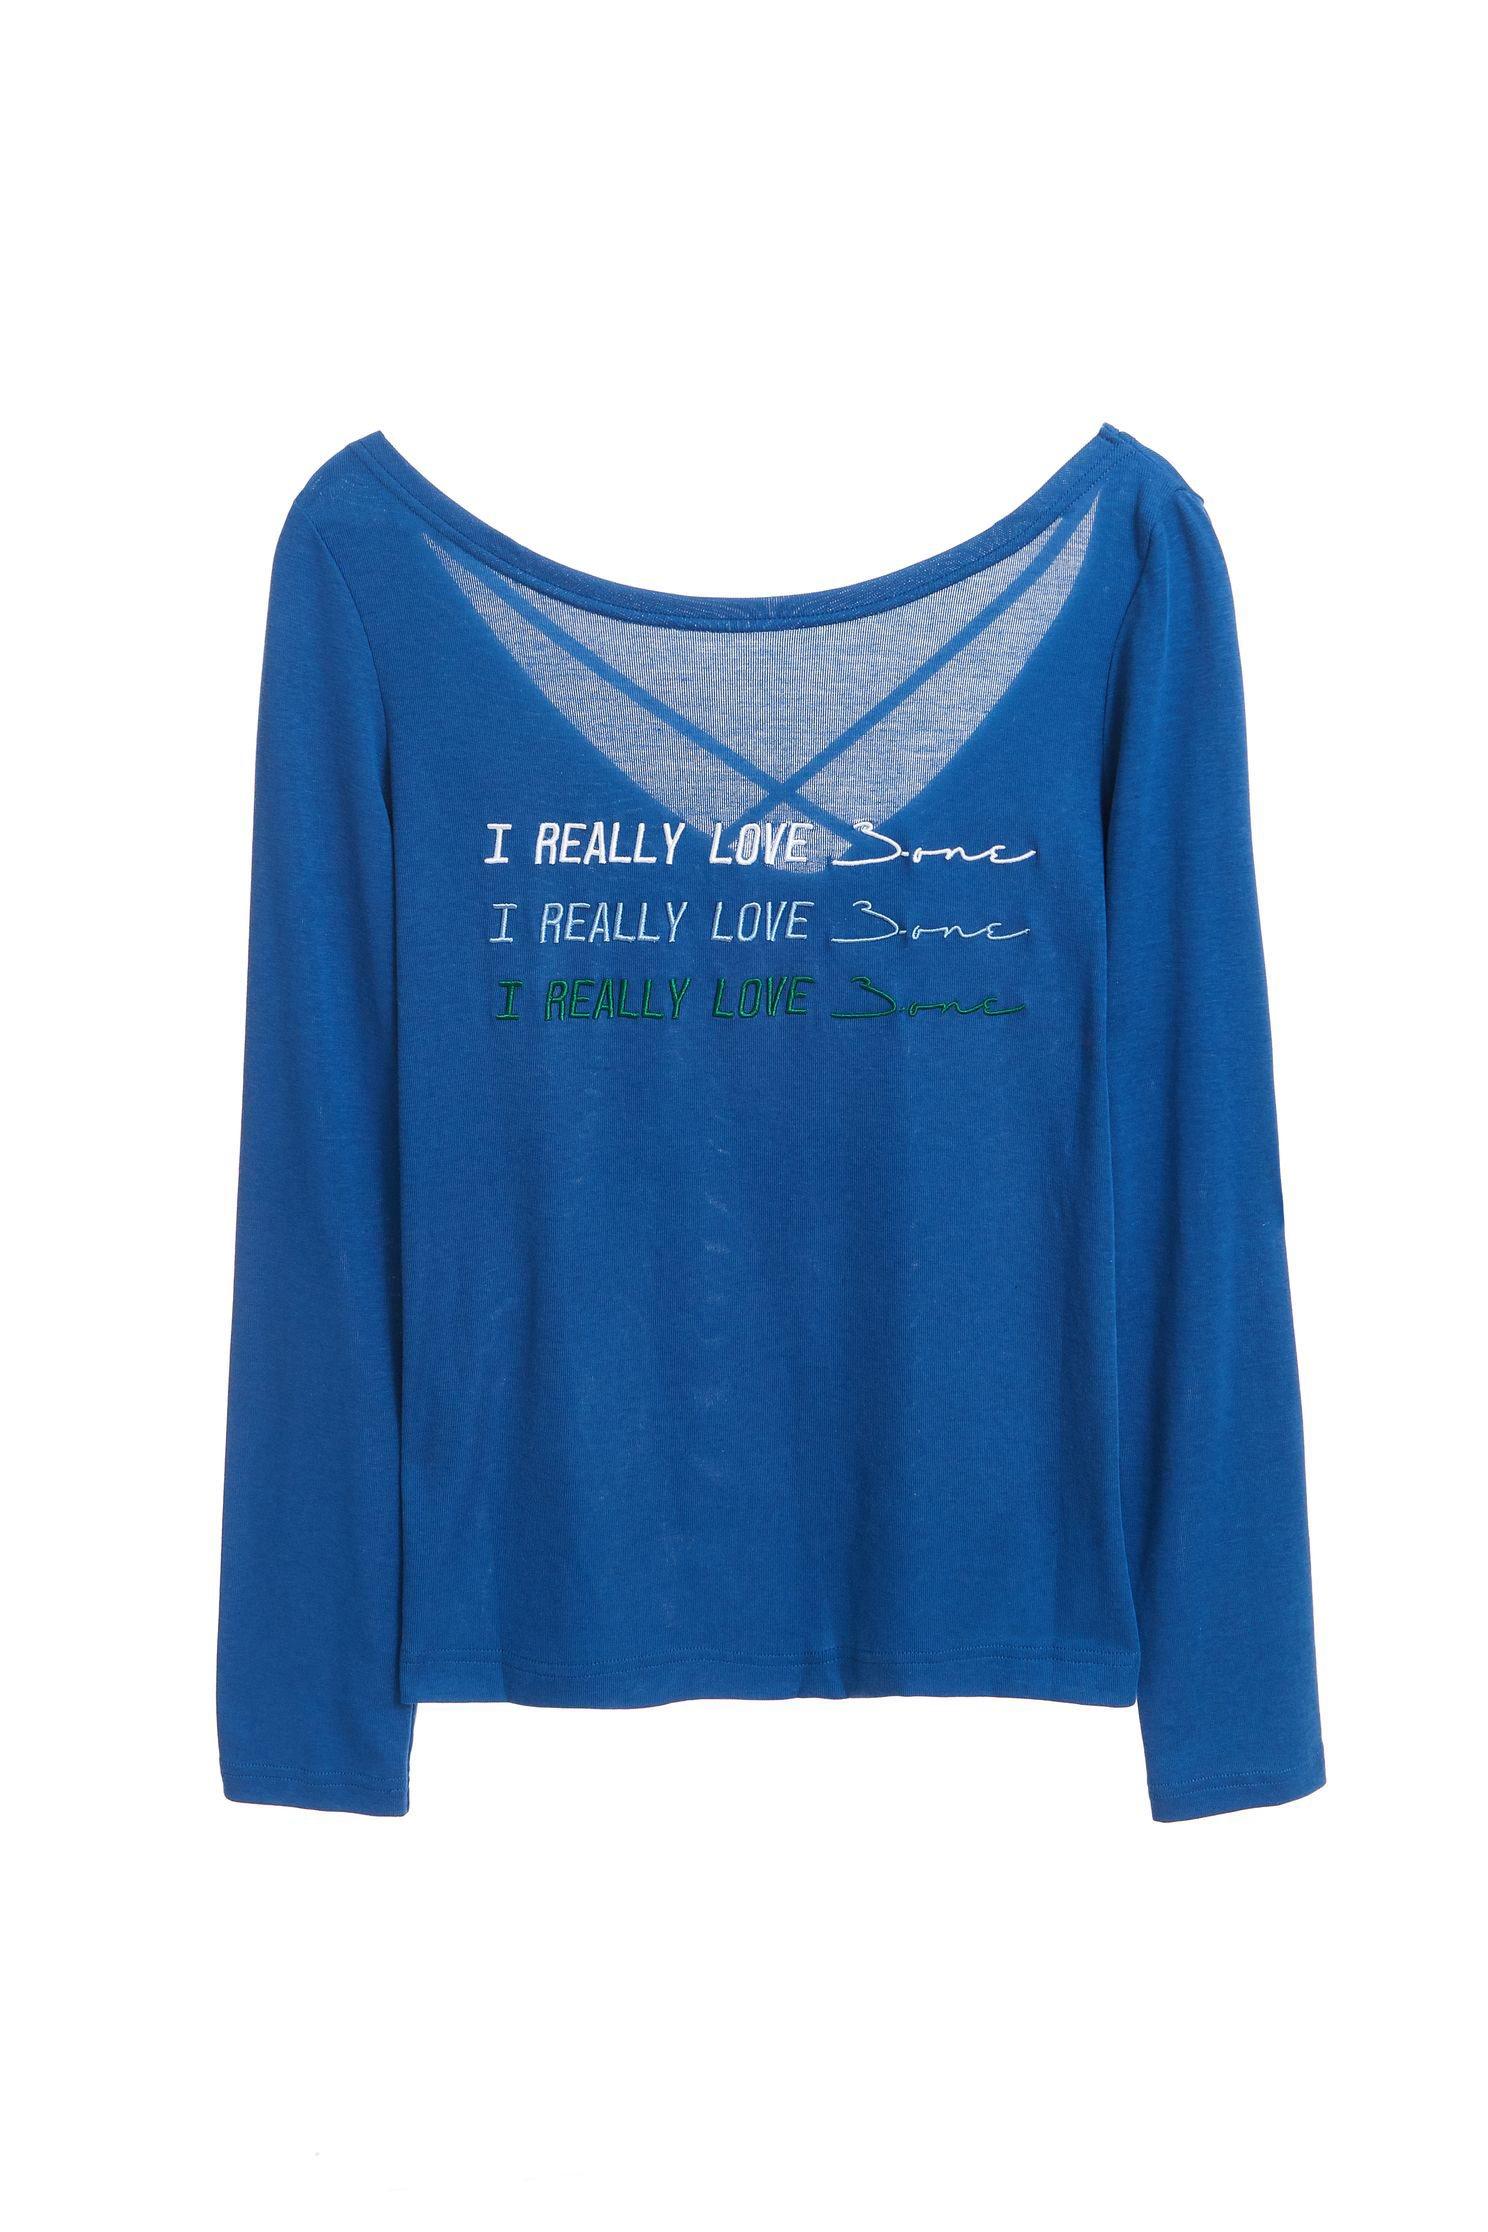 iRoo x 3.one Cotton logo T-shirt(blue)